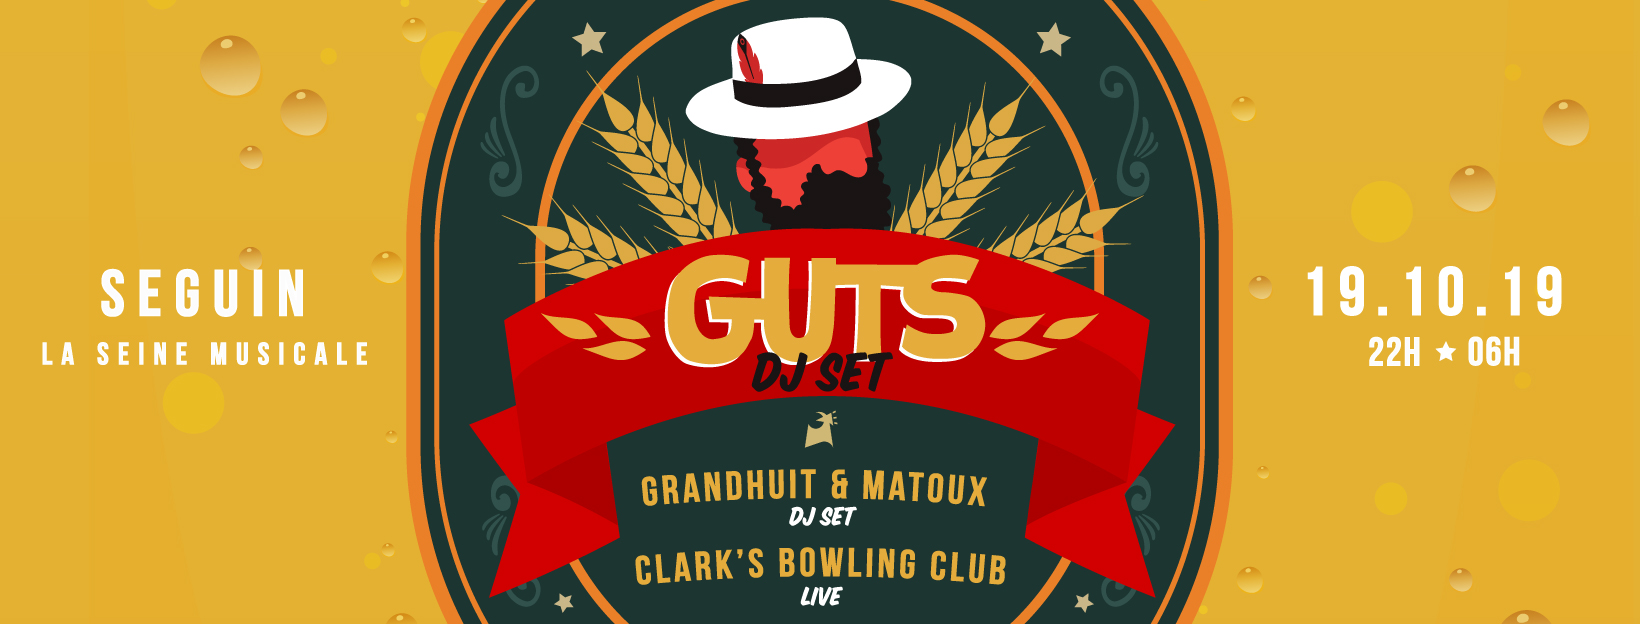 SEGUIN : GUTS (dj set) / GrandHuit & Matoux / Clark's Bowling Club (live band)